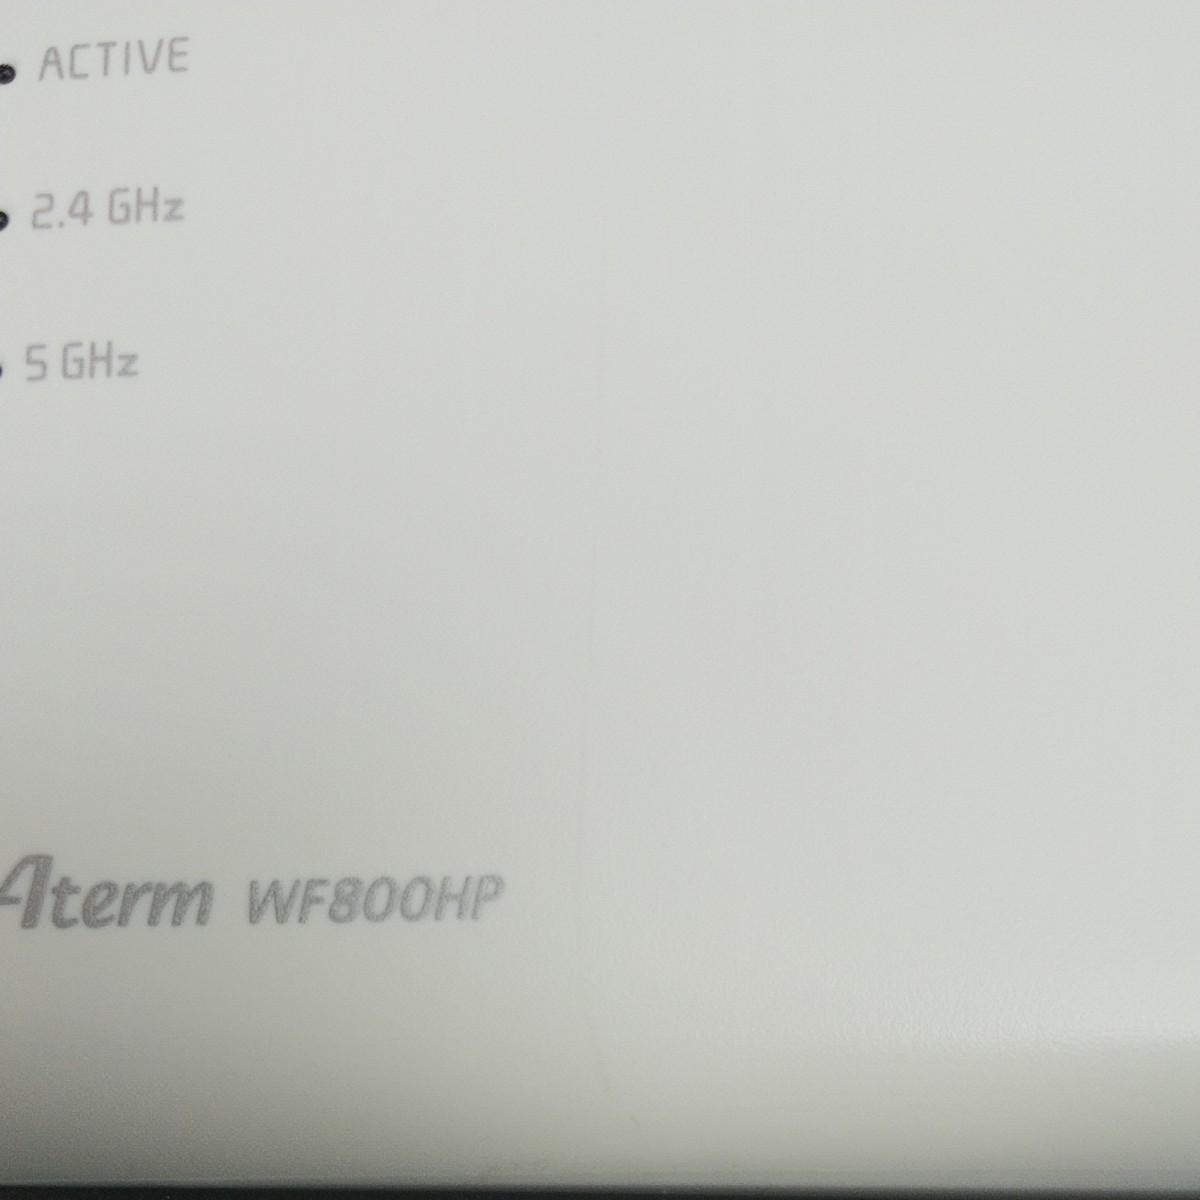 NEC  Aterm WF800HP 無線LANルーター